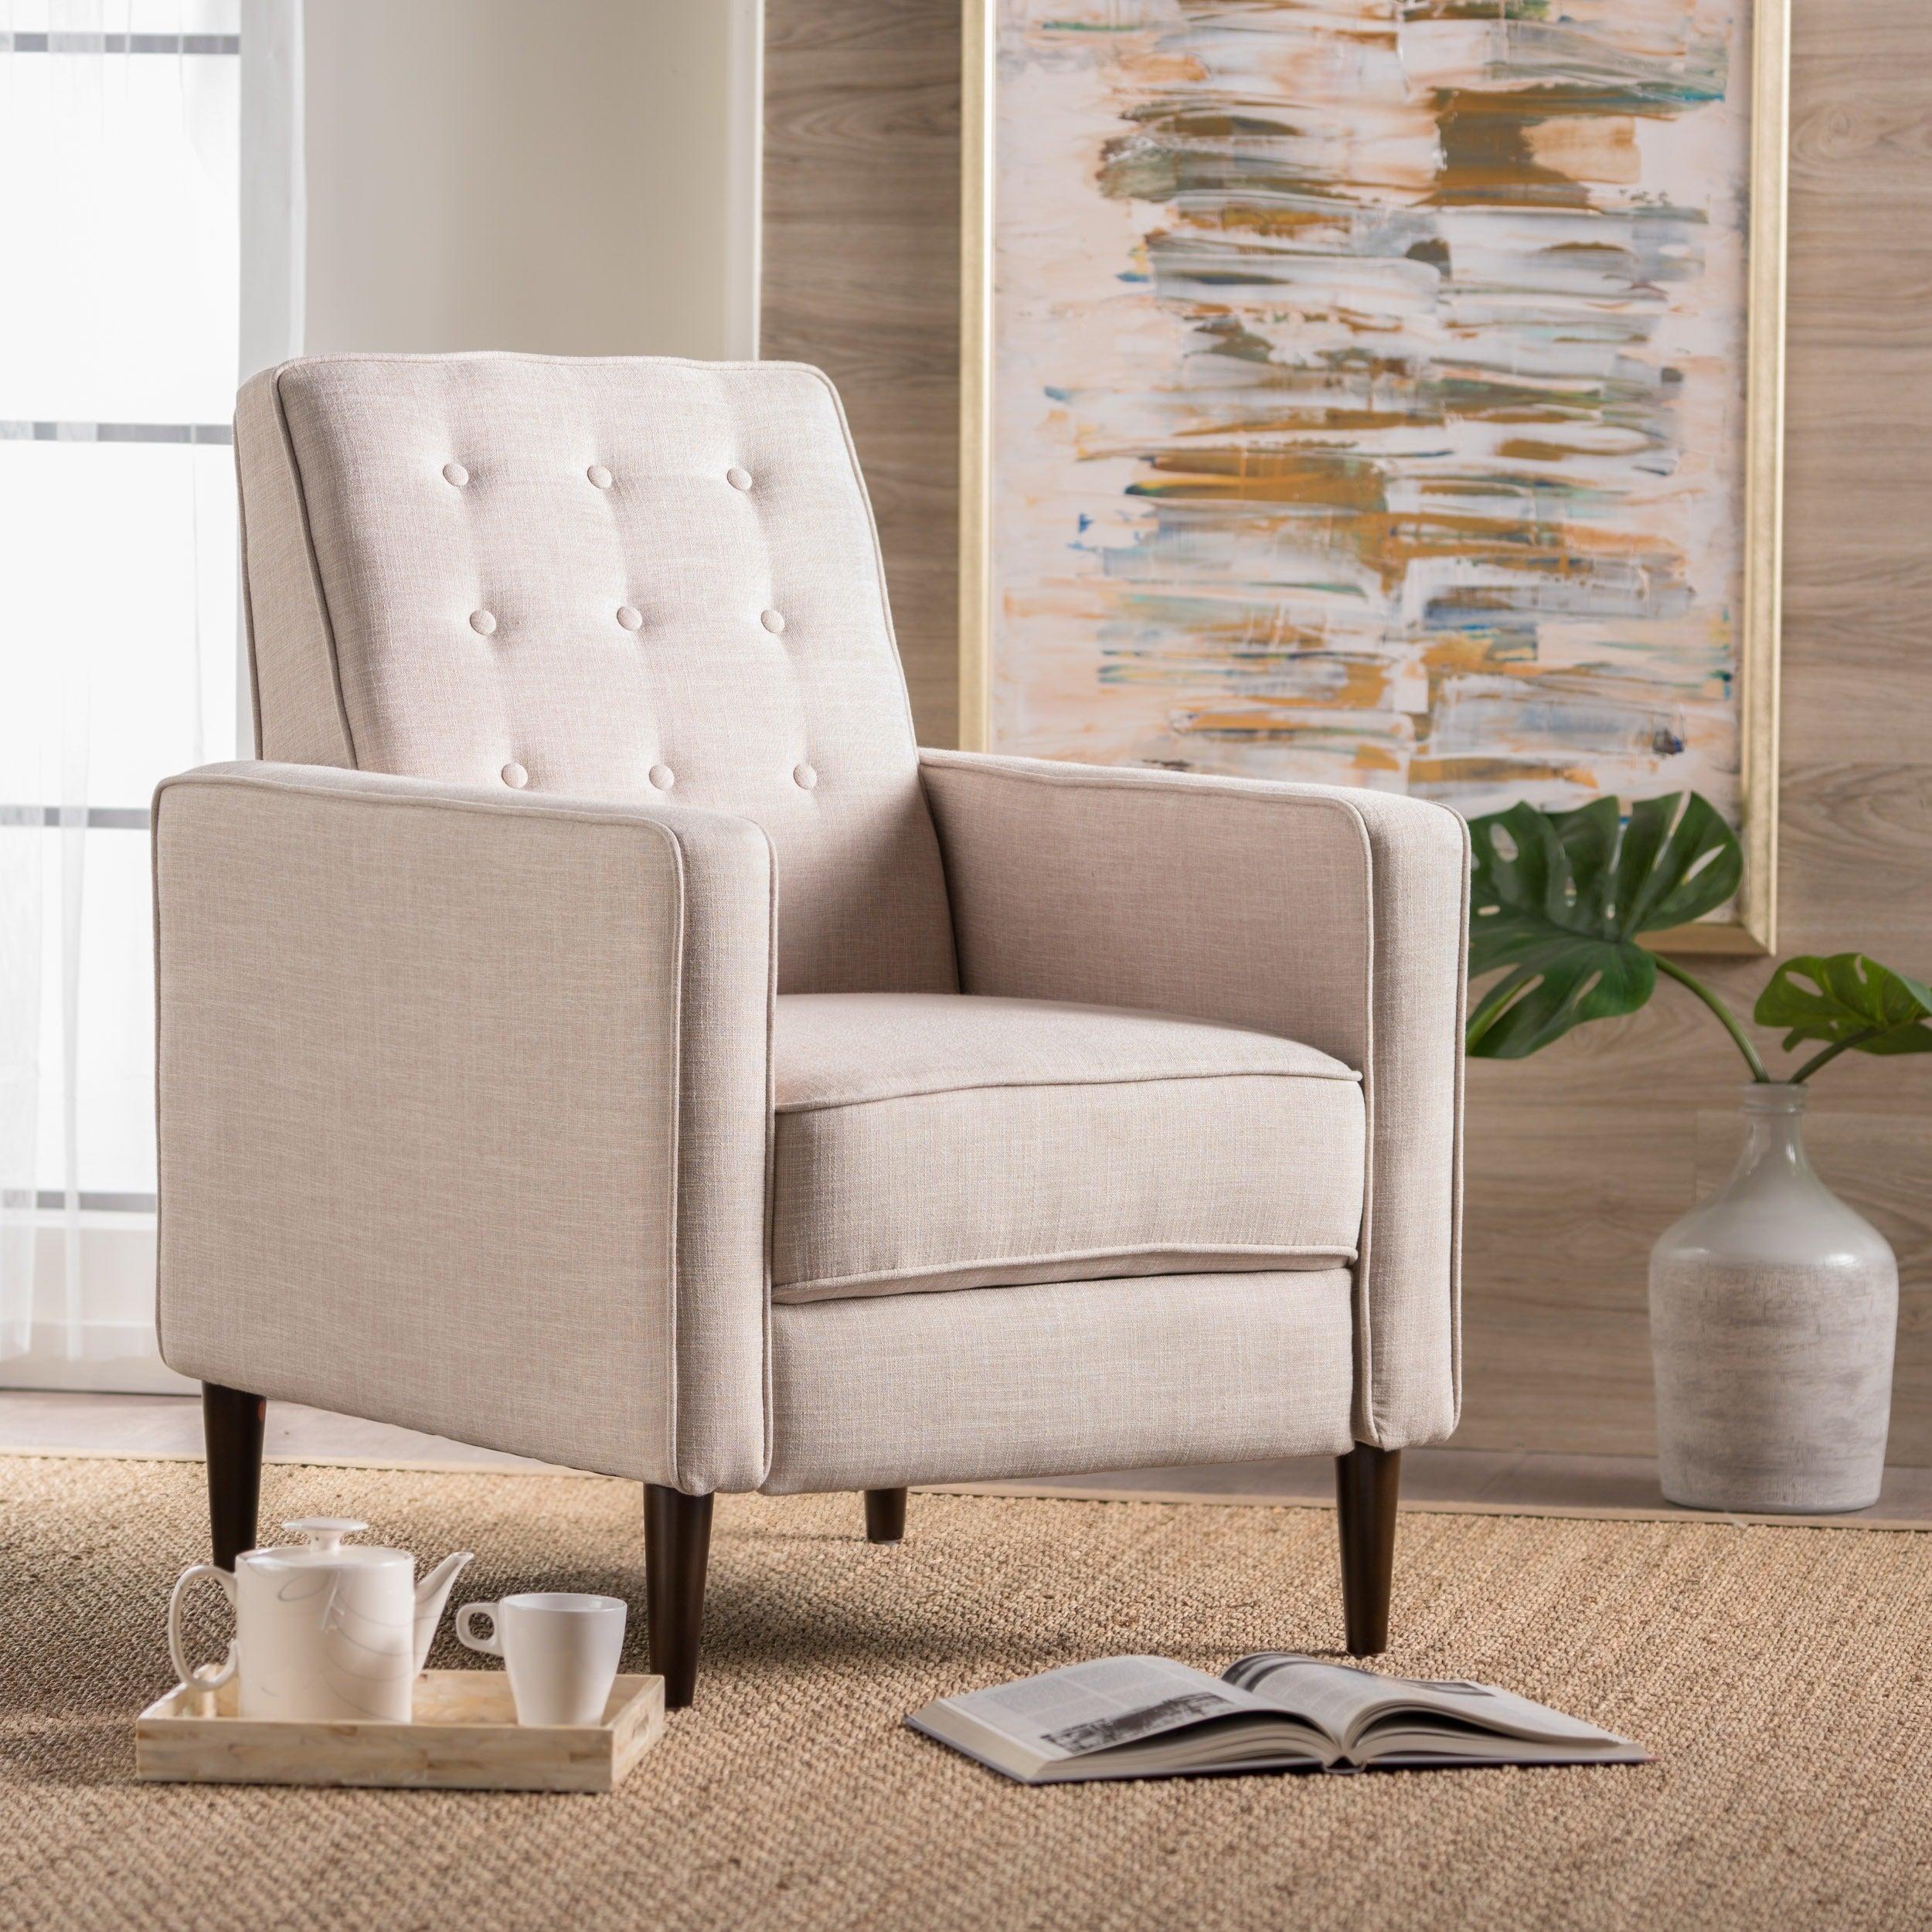 Fabulous Mervynn Mid Century Button Tufted Fabric Recliner Club Chair By Christopher Knight Home Machost Co Dining Chair Design Ideas Machostcouk